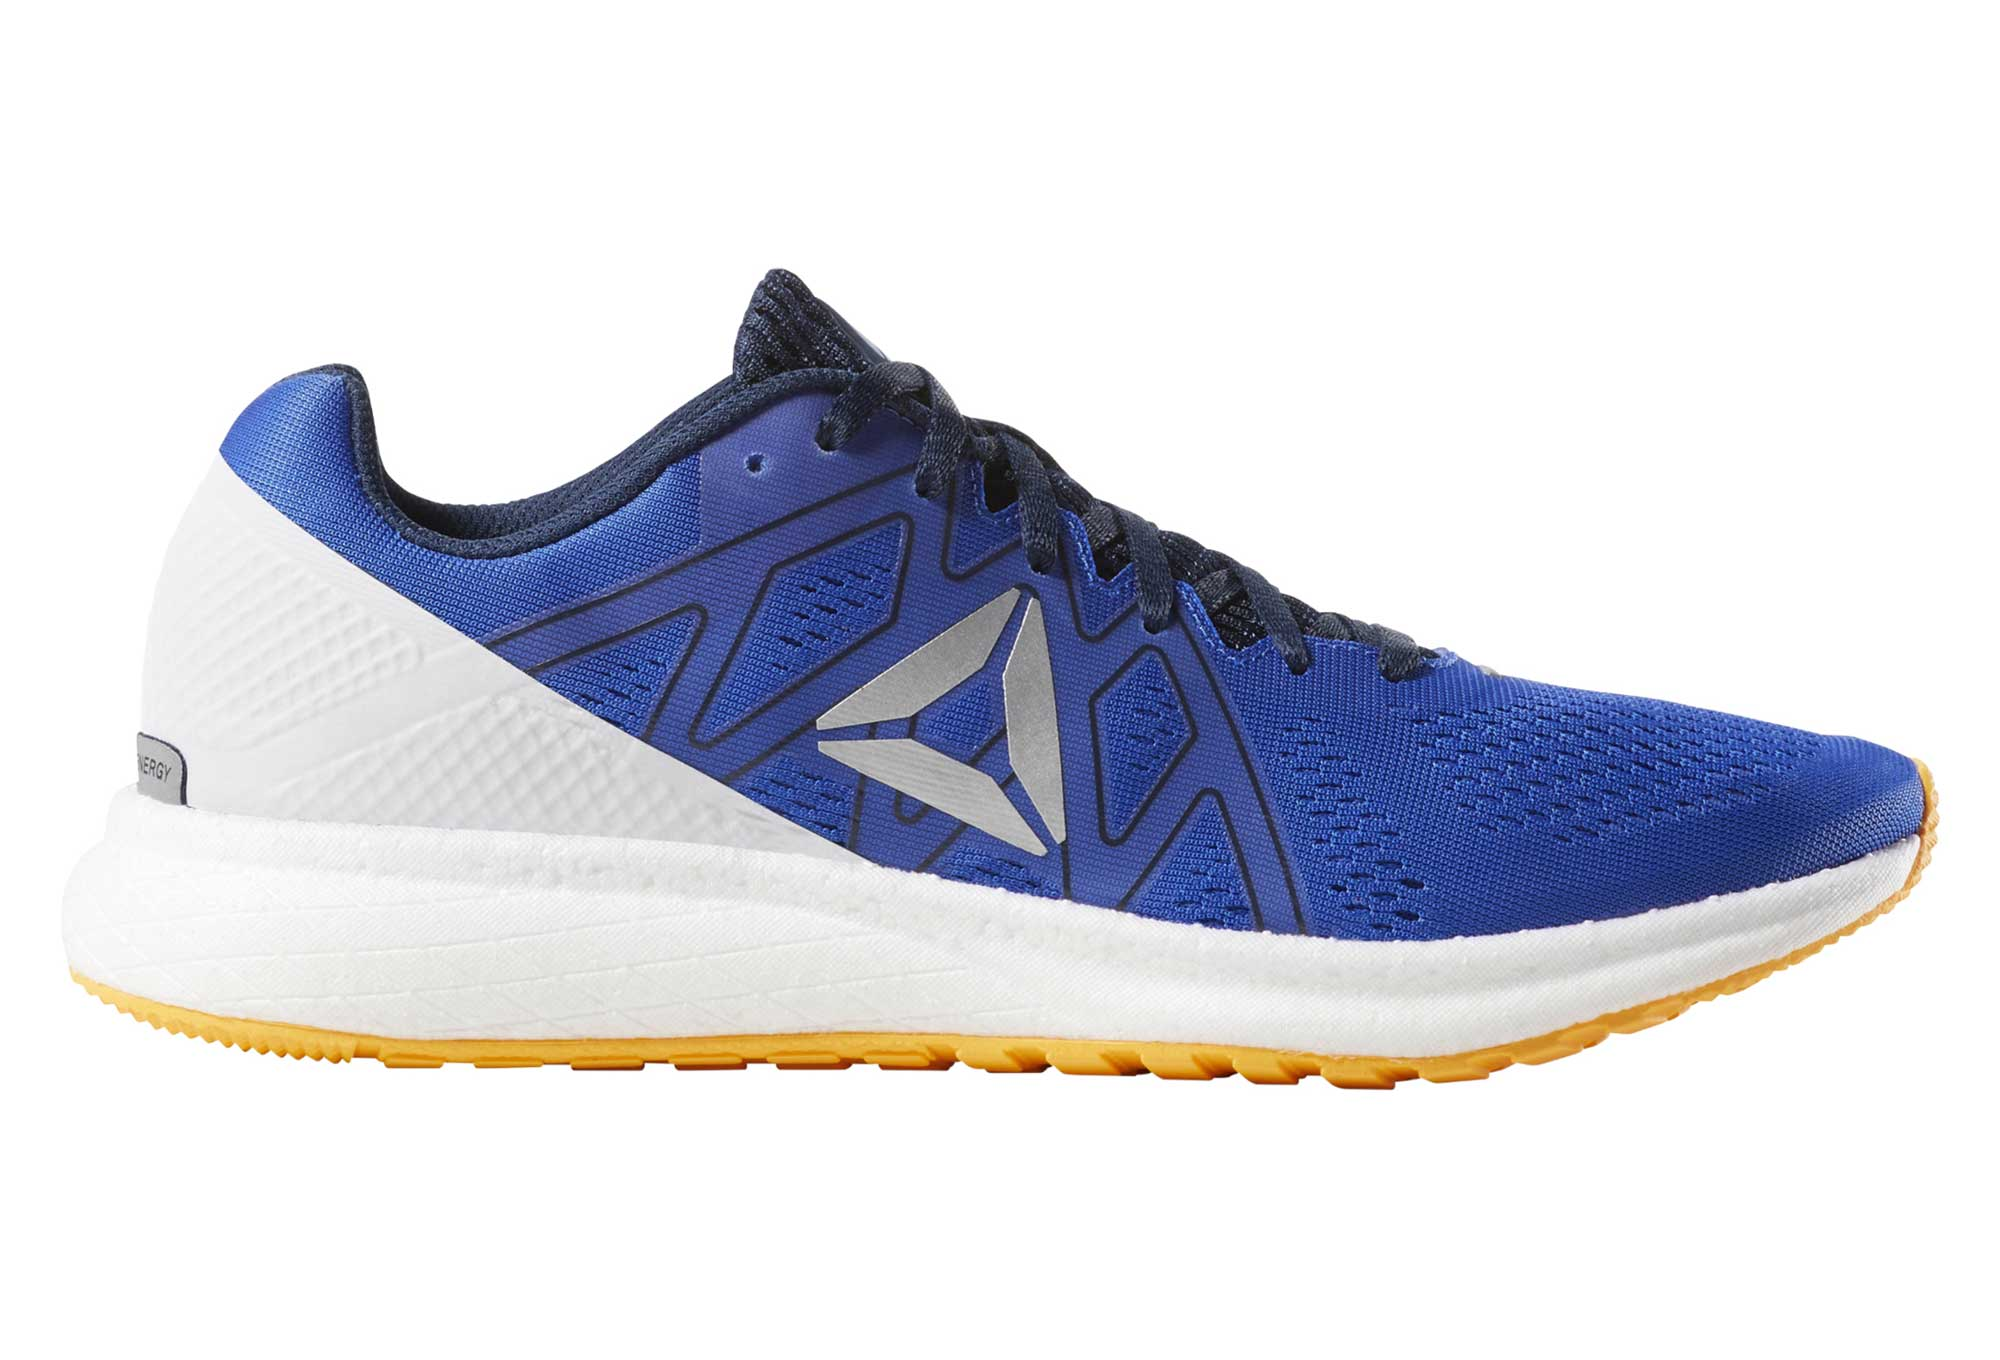 Chaussures de Running Reebok Forever Floatride Energy Bleu Blanc